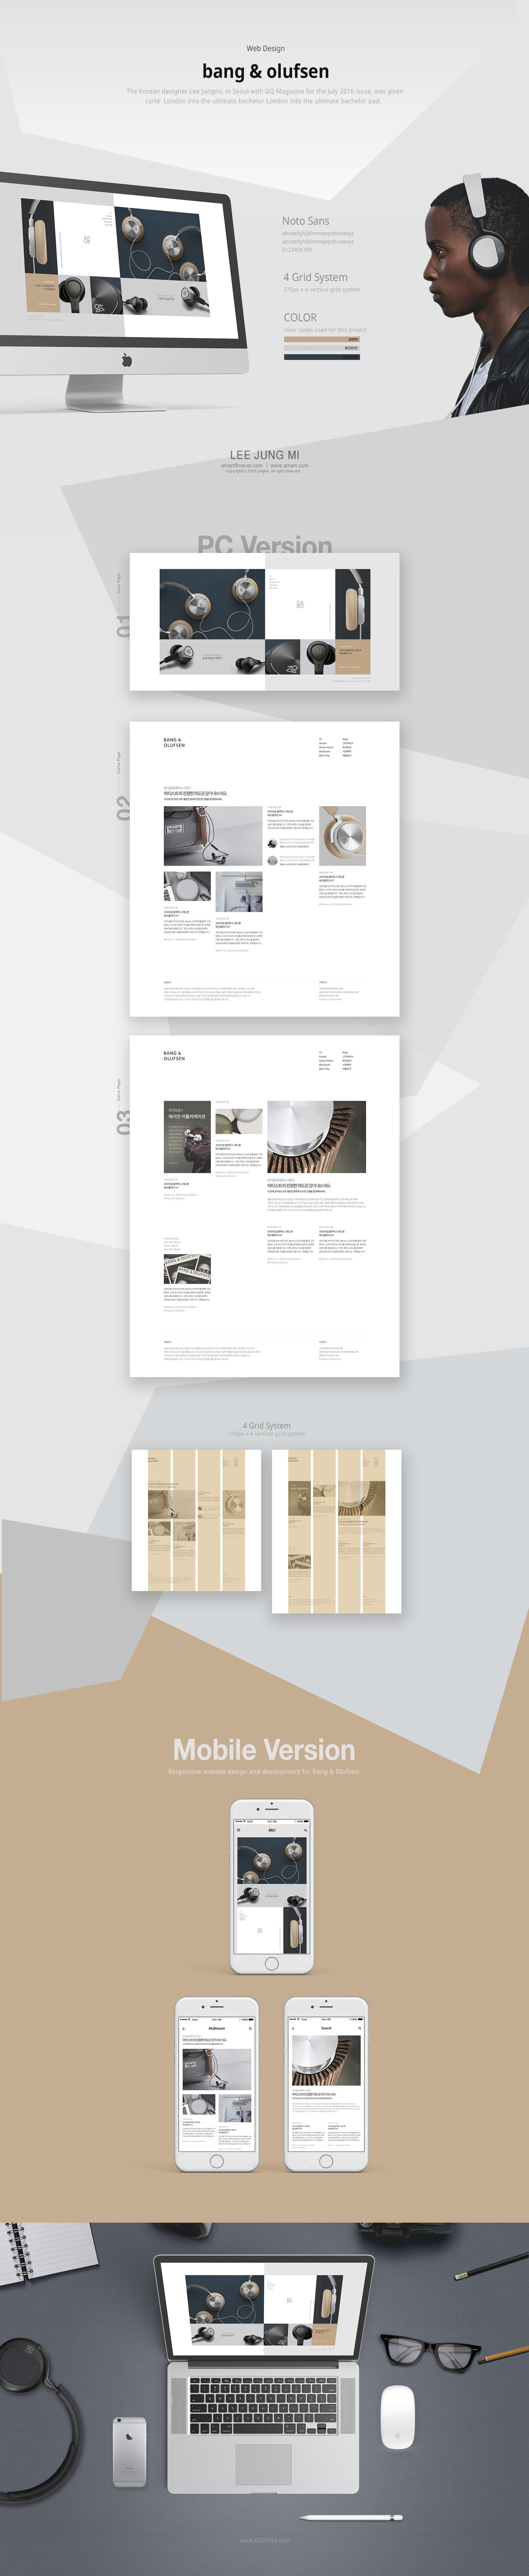 Bang & Olufsen redesign - Design - Lee-jungmee